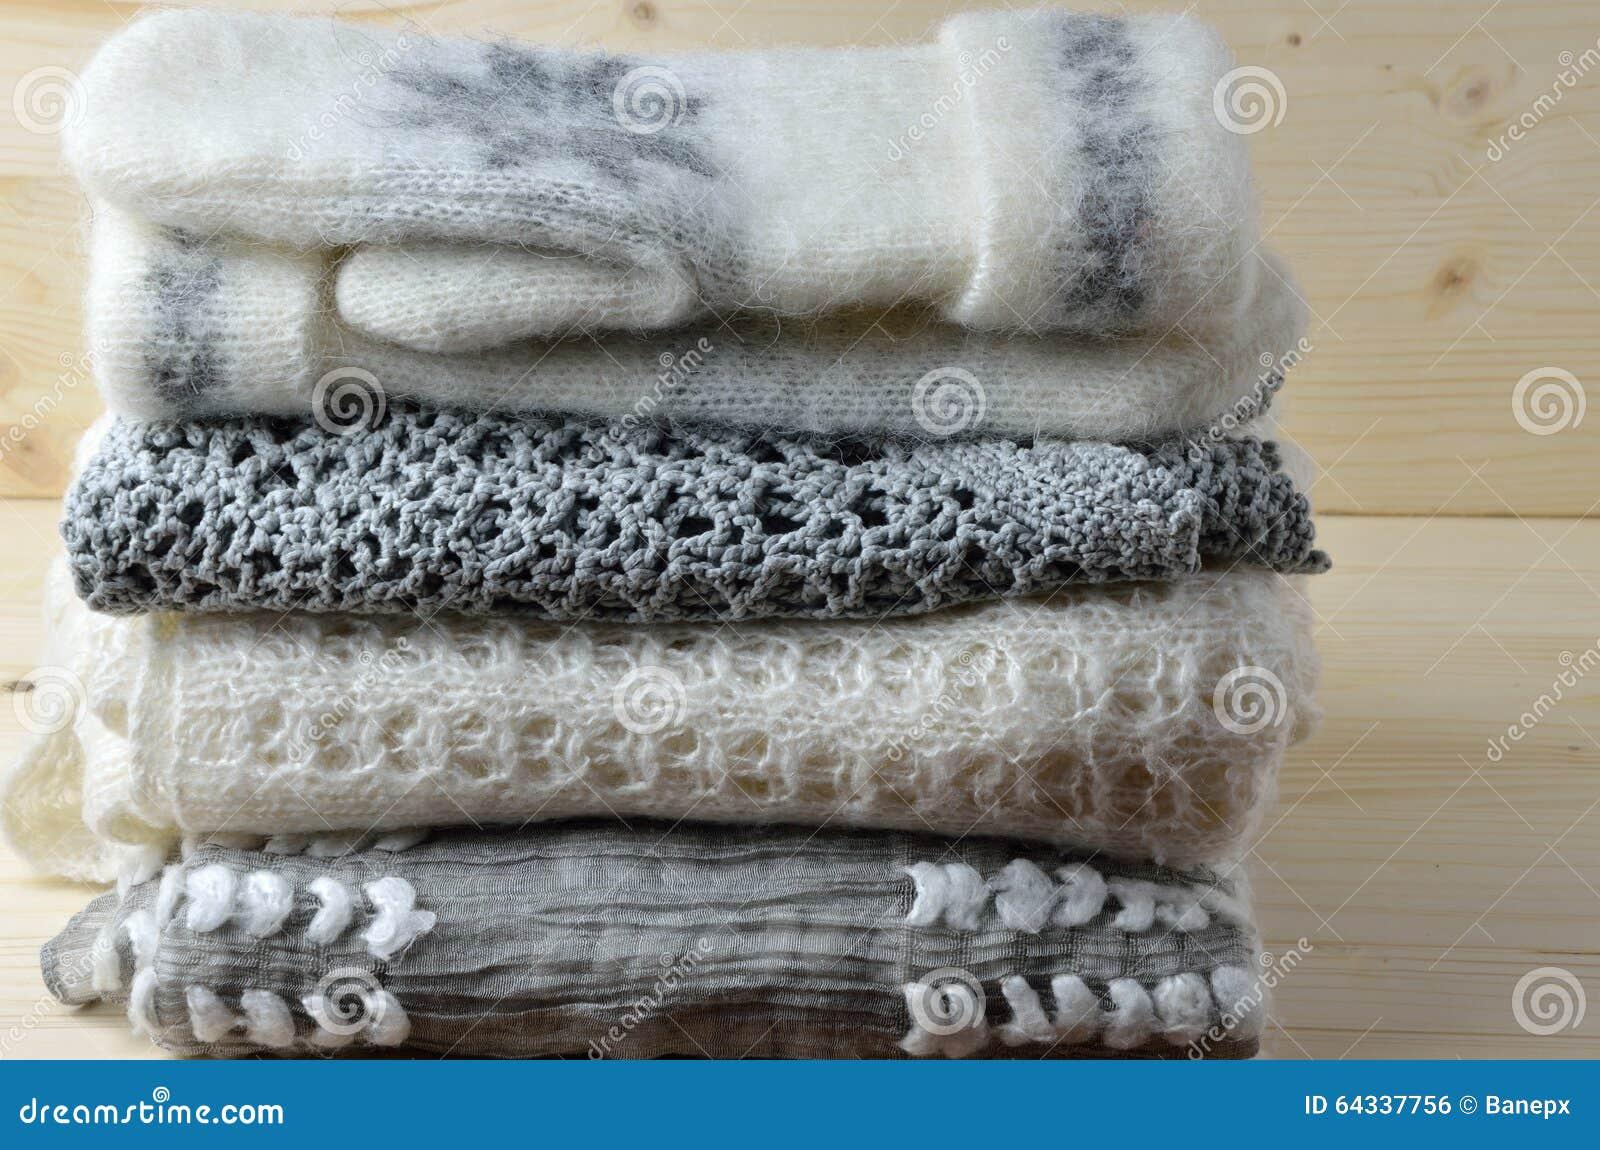 Maglioni, sciarpa e guanti di lana grigi e bianchi